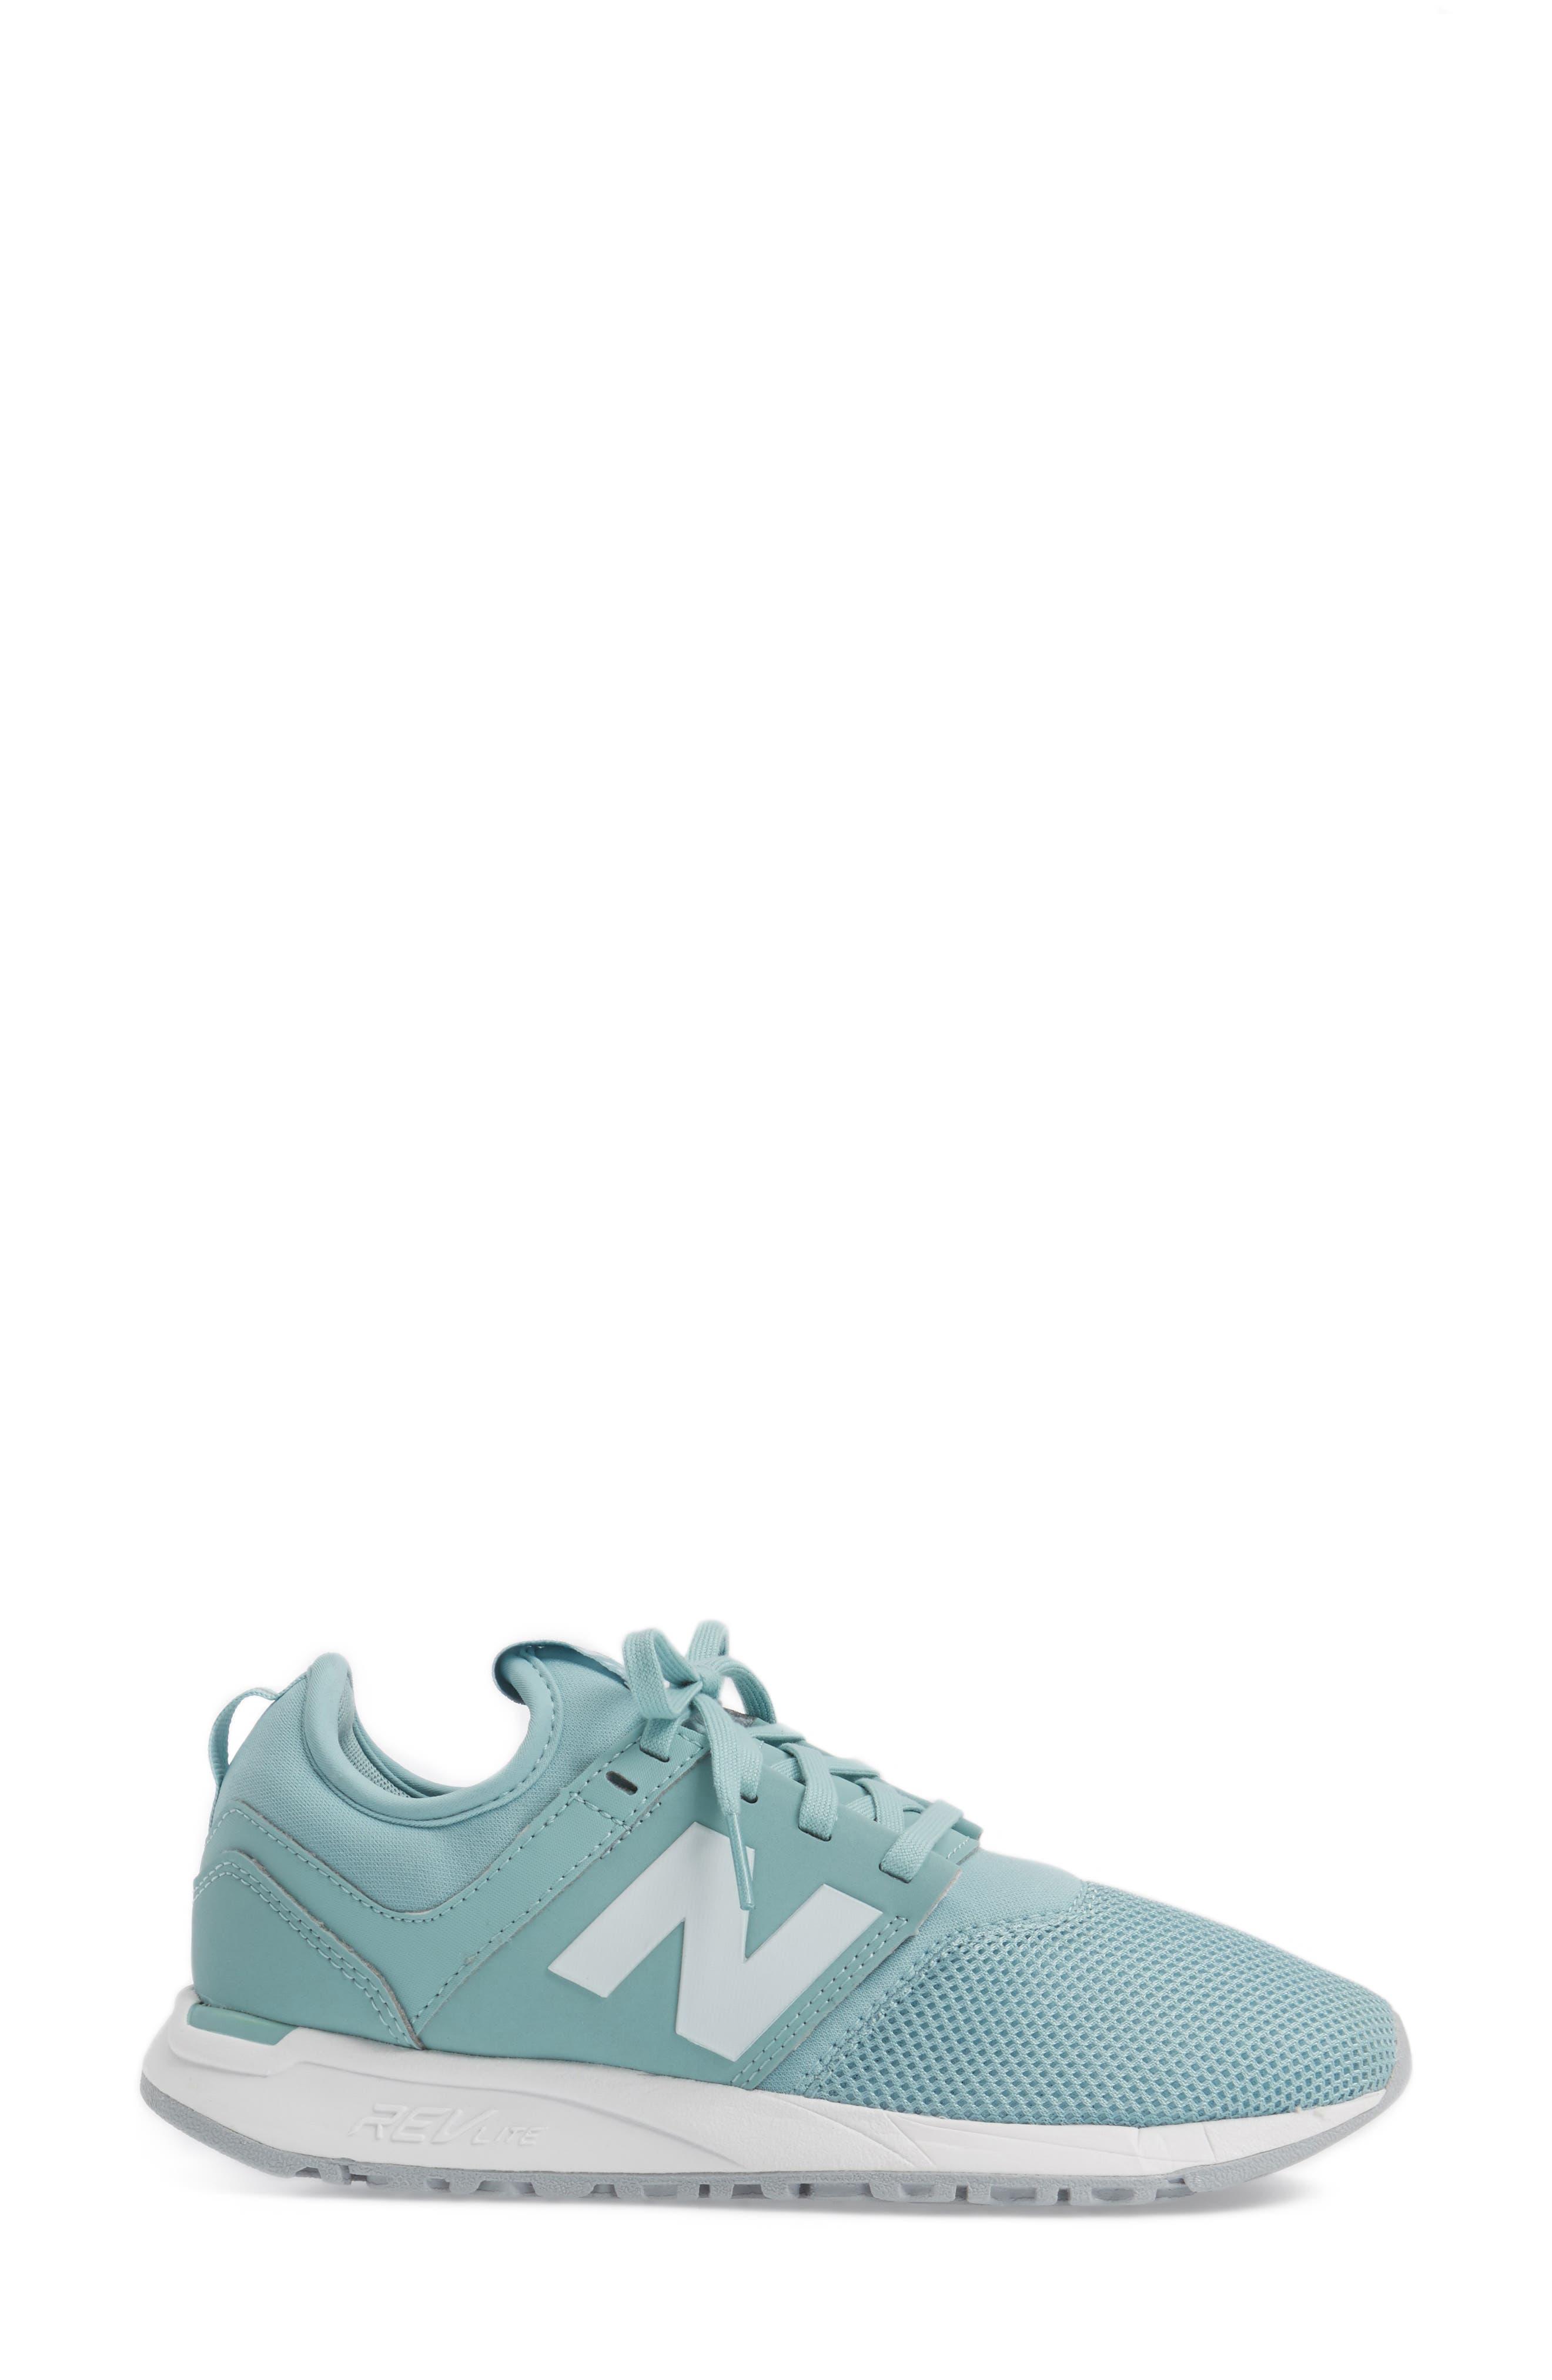 Alternate Image 3  - New Balance Sport Style 247 Sneaker (Women)